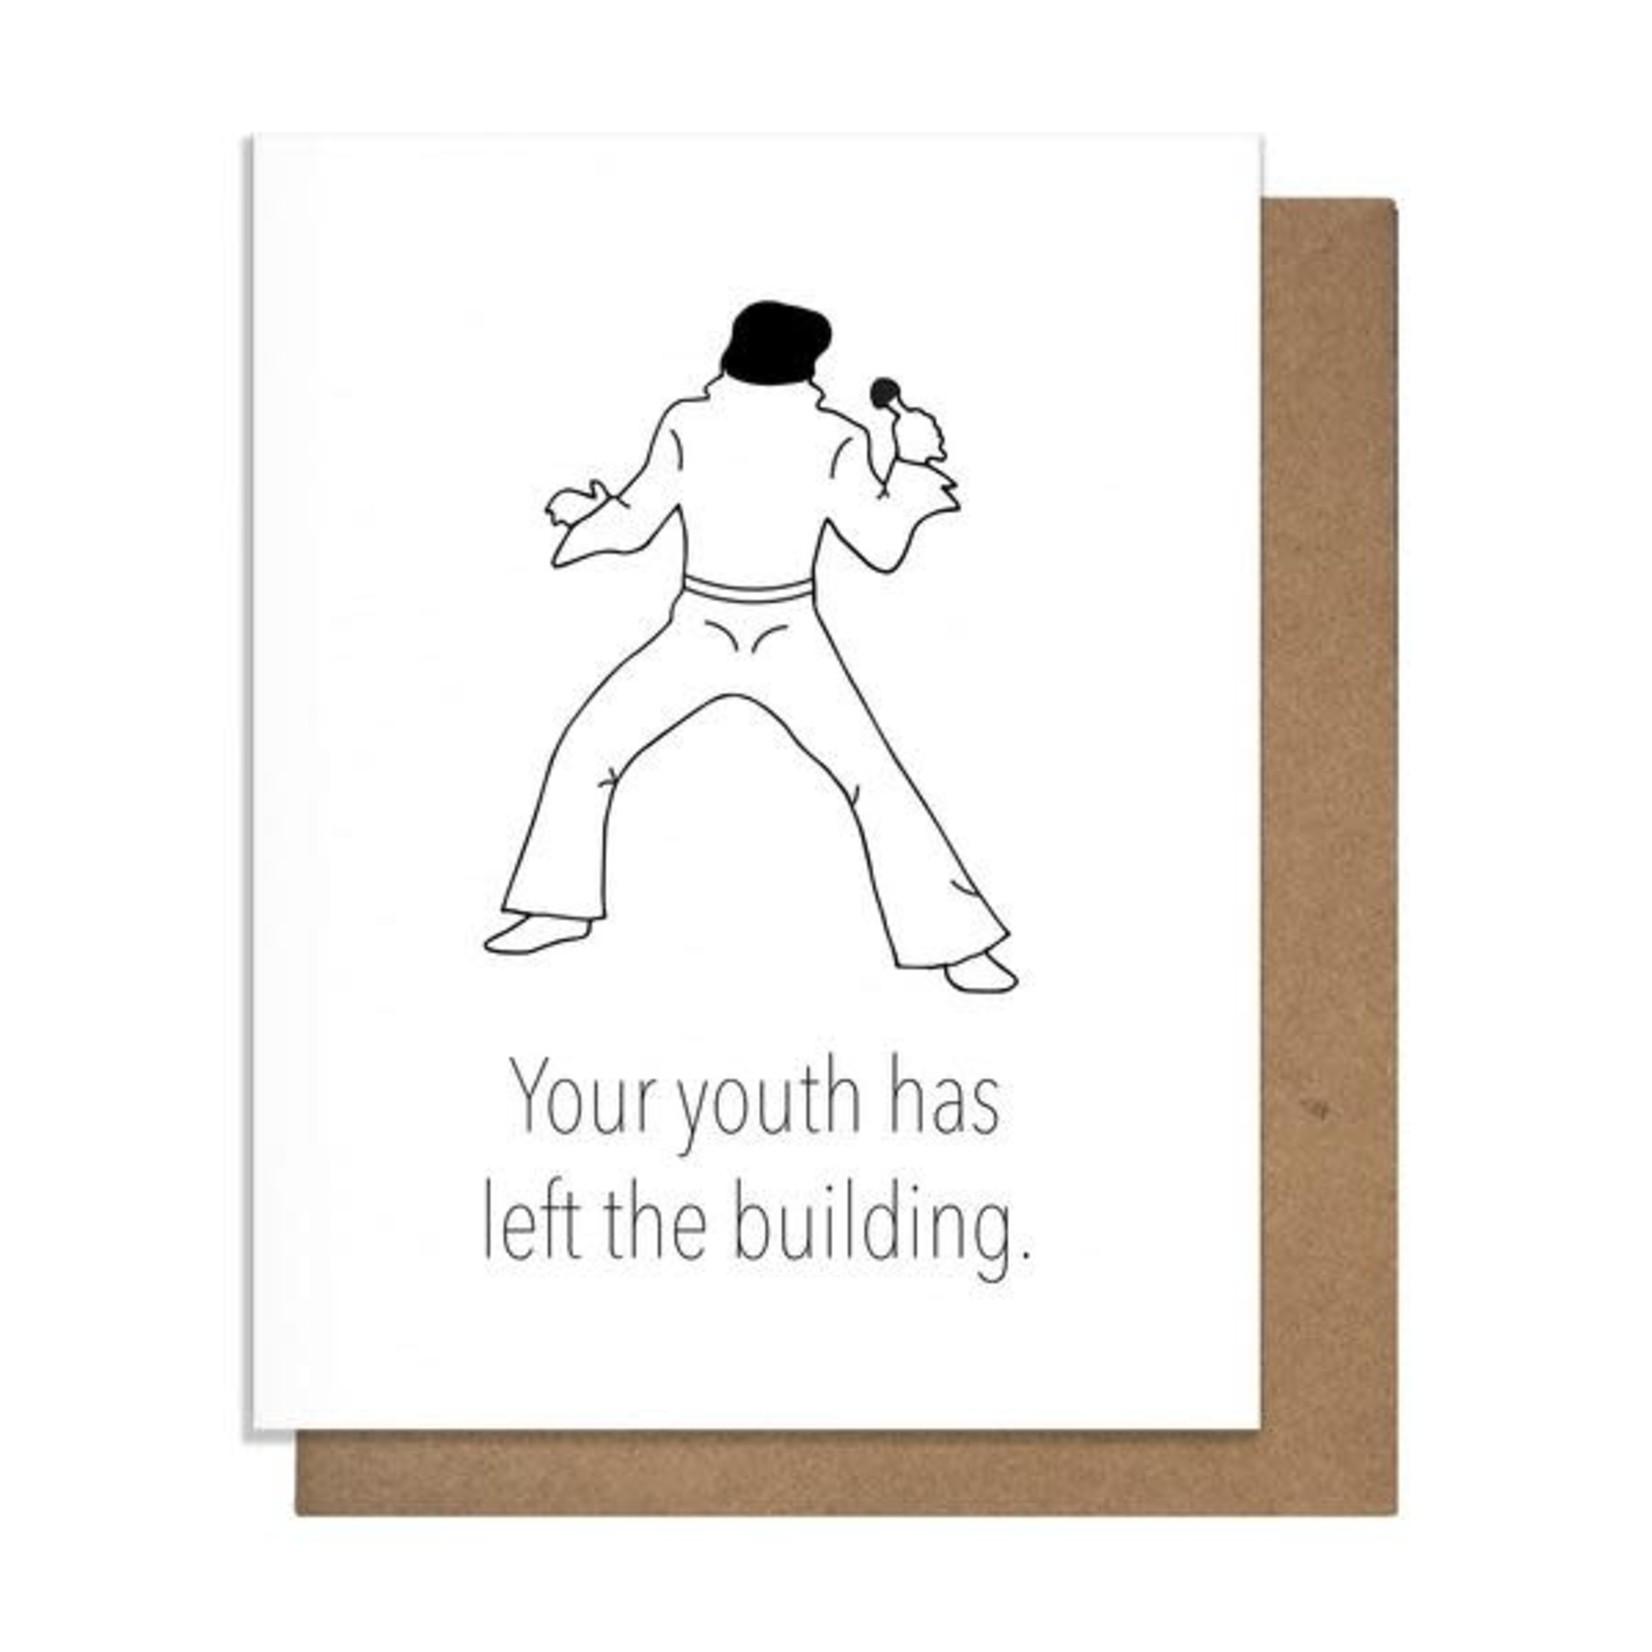 Pretty Alright Goods Elvis Birthday Card